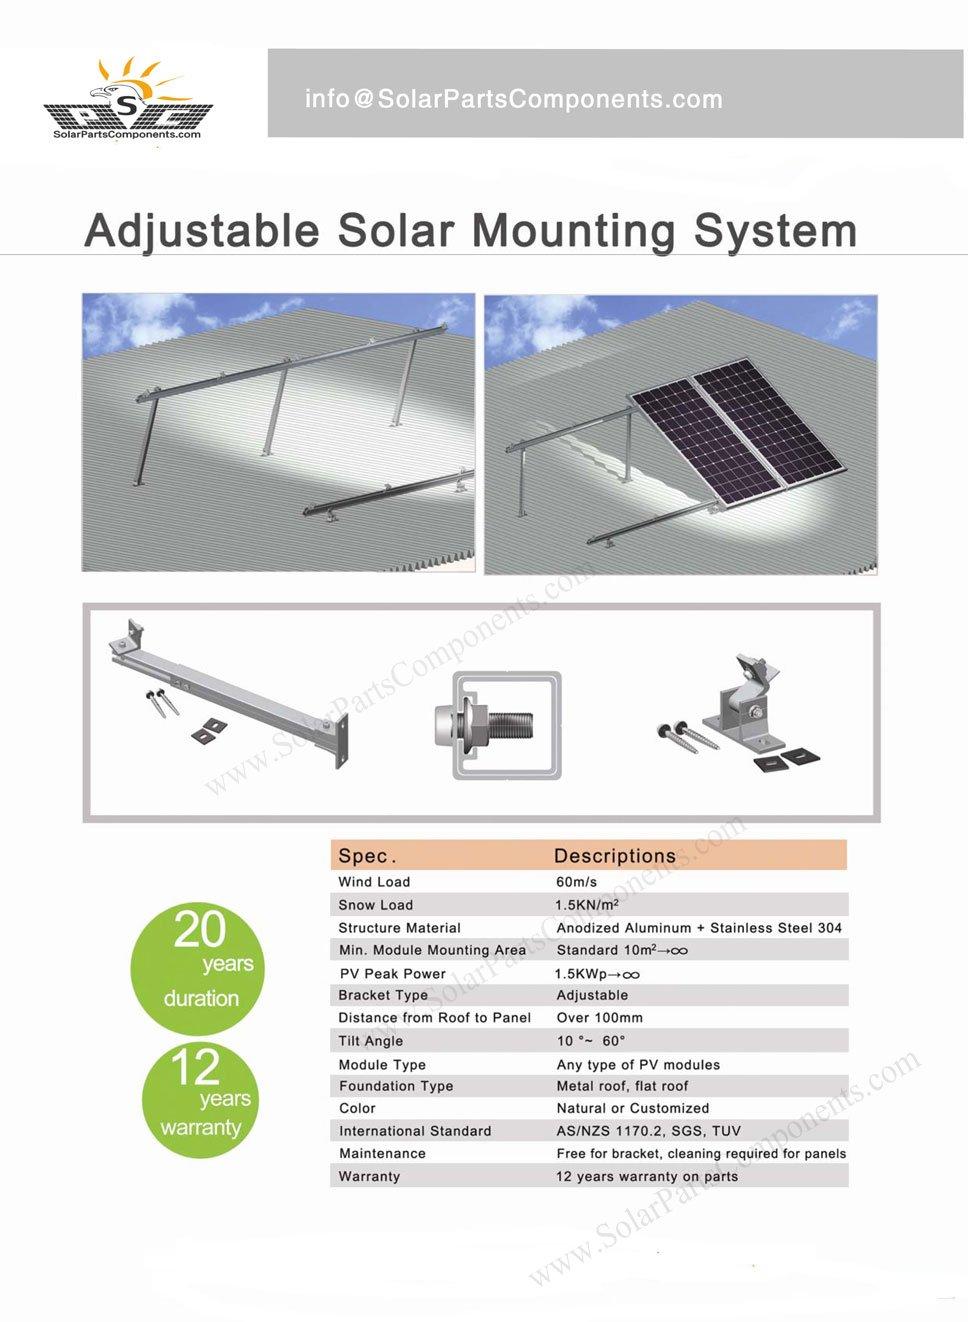 Adjustable Solar Panel Mounting System